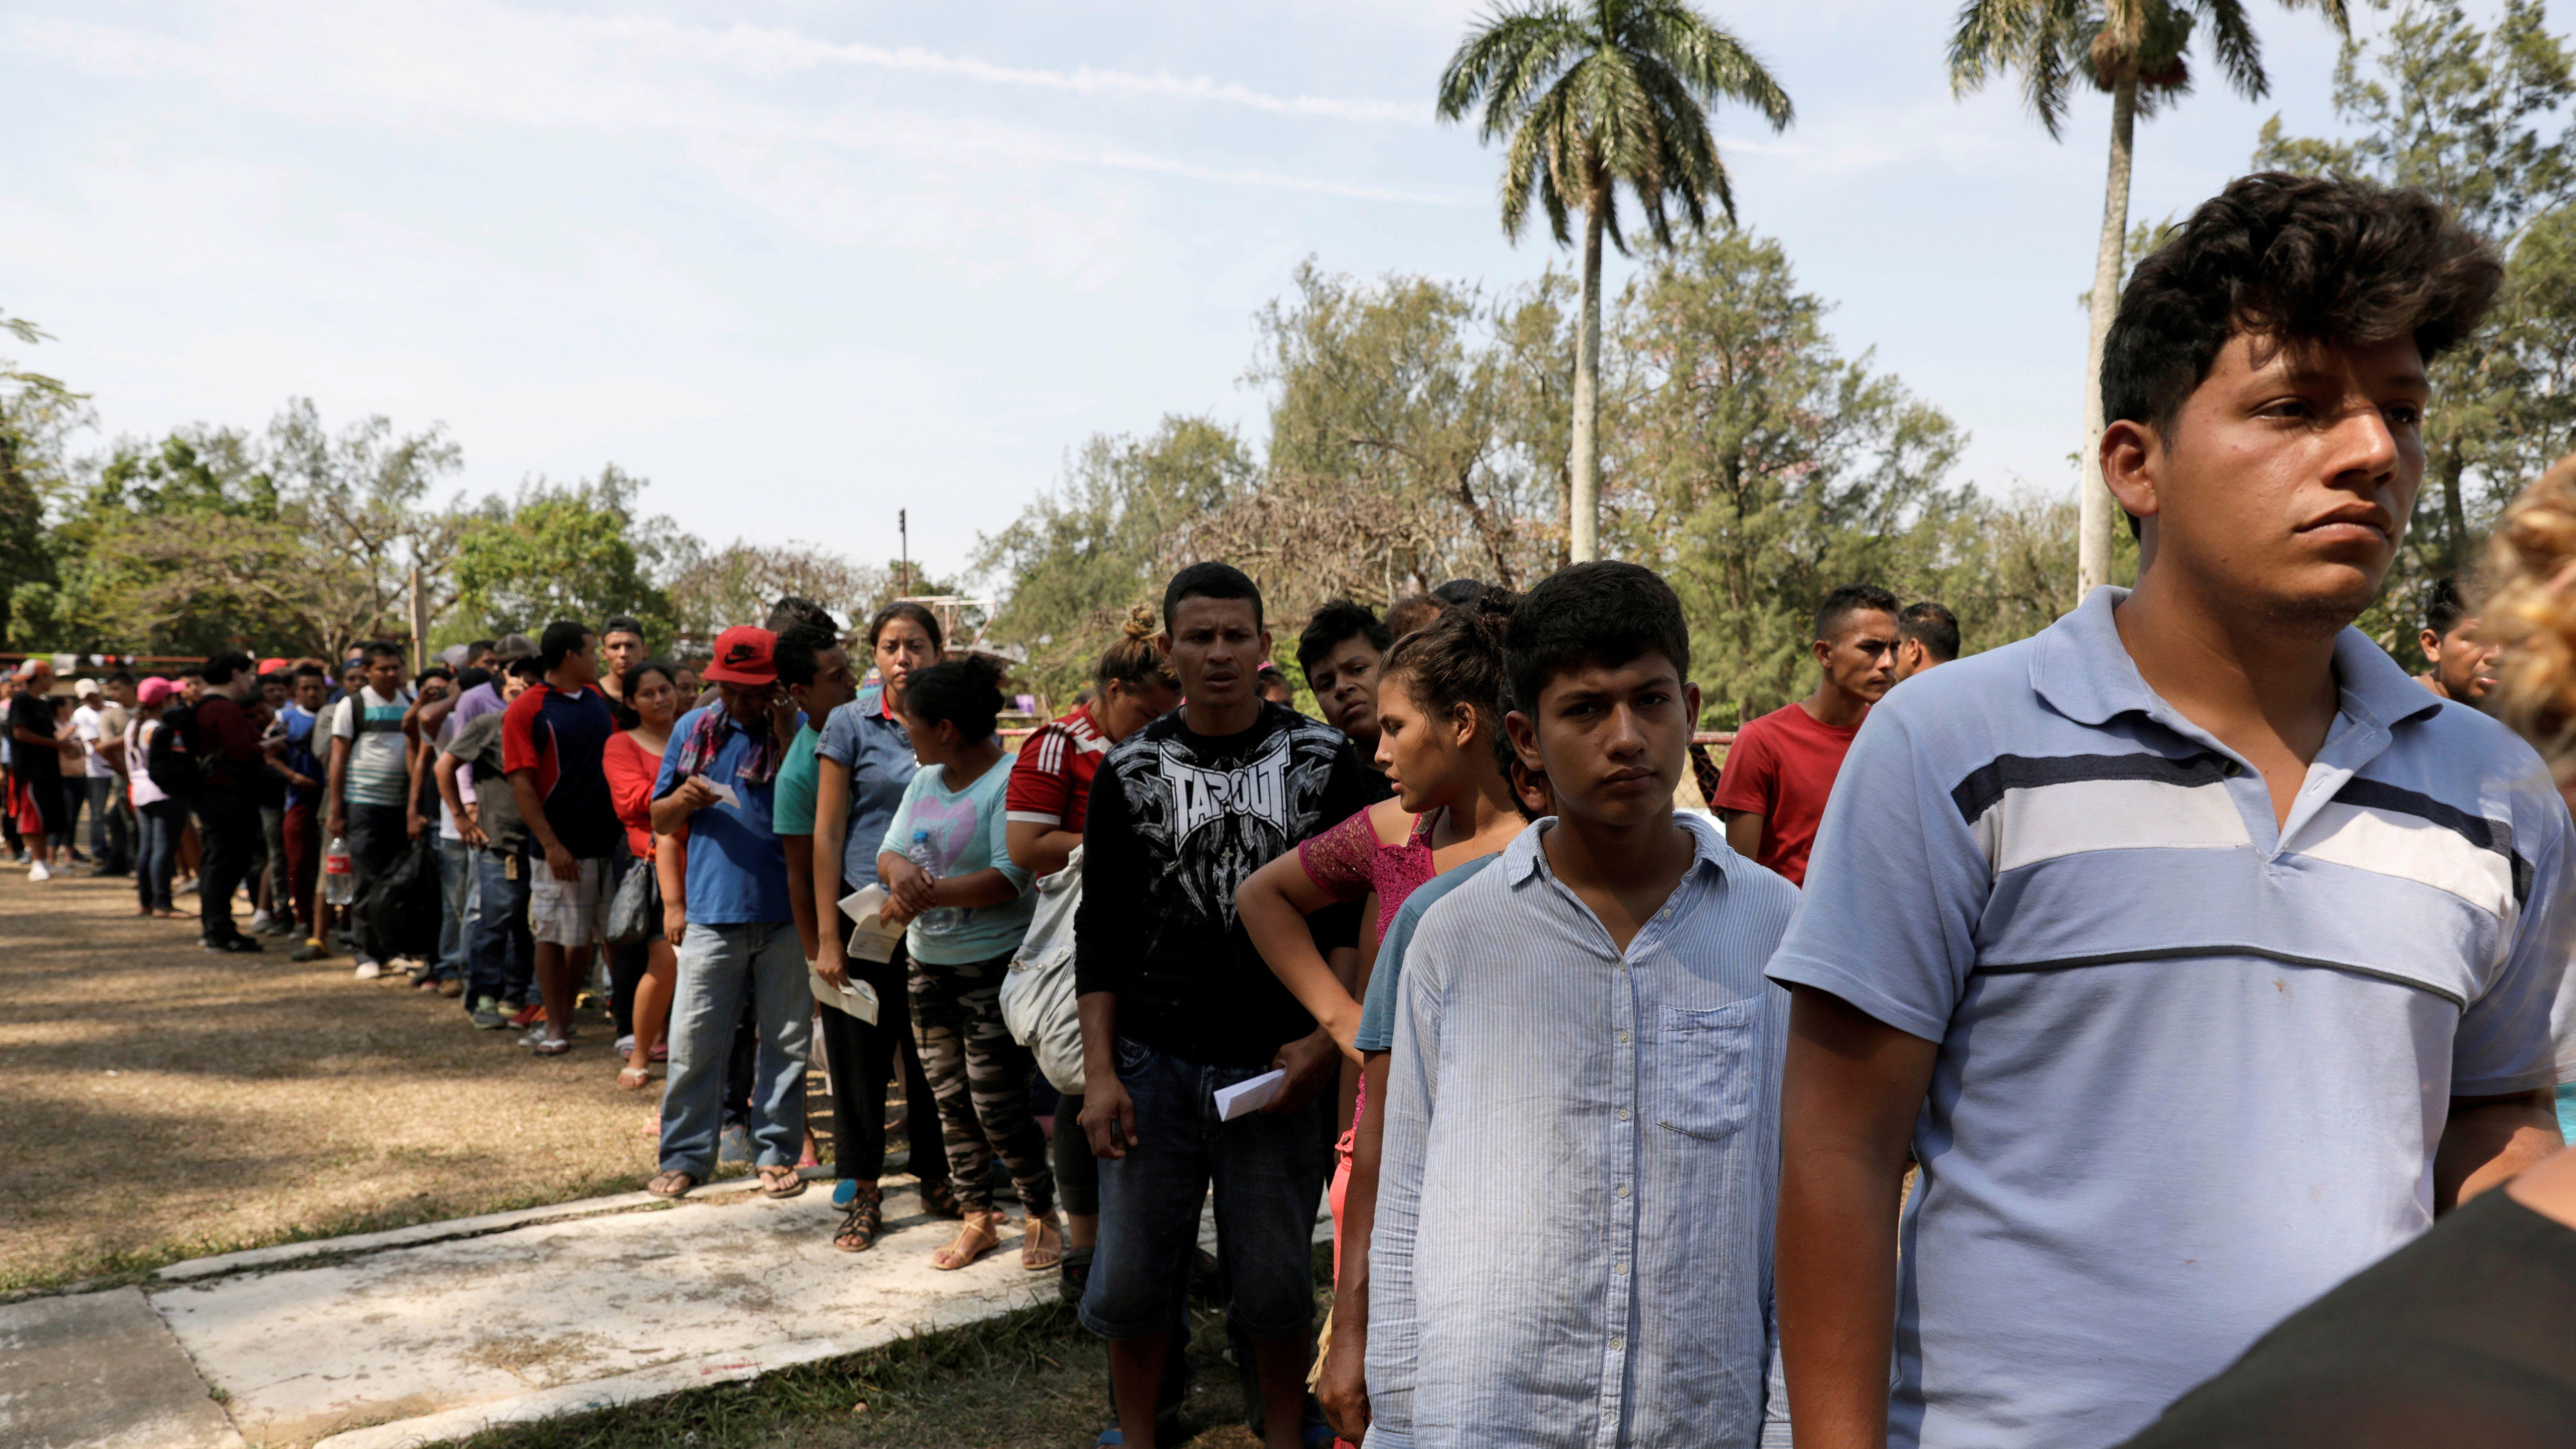 Central American migrants, part of a caravan moving through Mexico toward the U.S. border